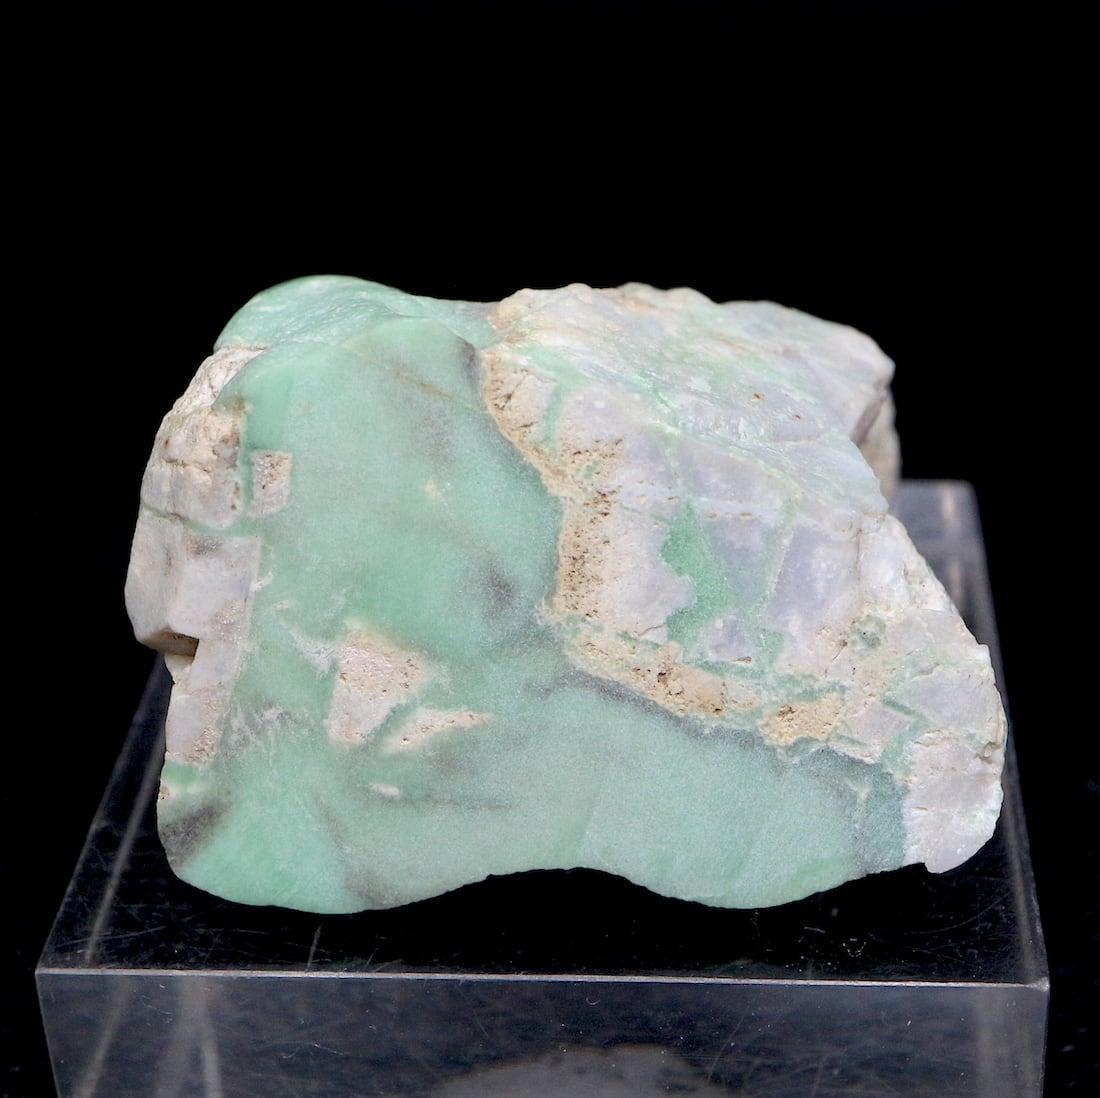 ※SALE※バリサイト 結晶 Variscite ユタ州産 28,6g 原石 VRS012 天然石 パワーストーン